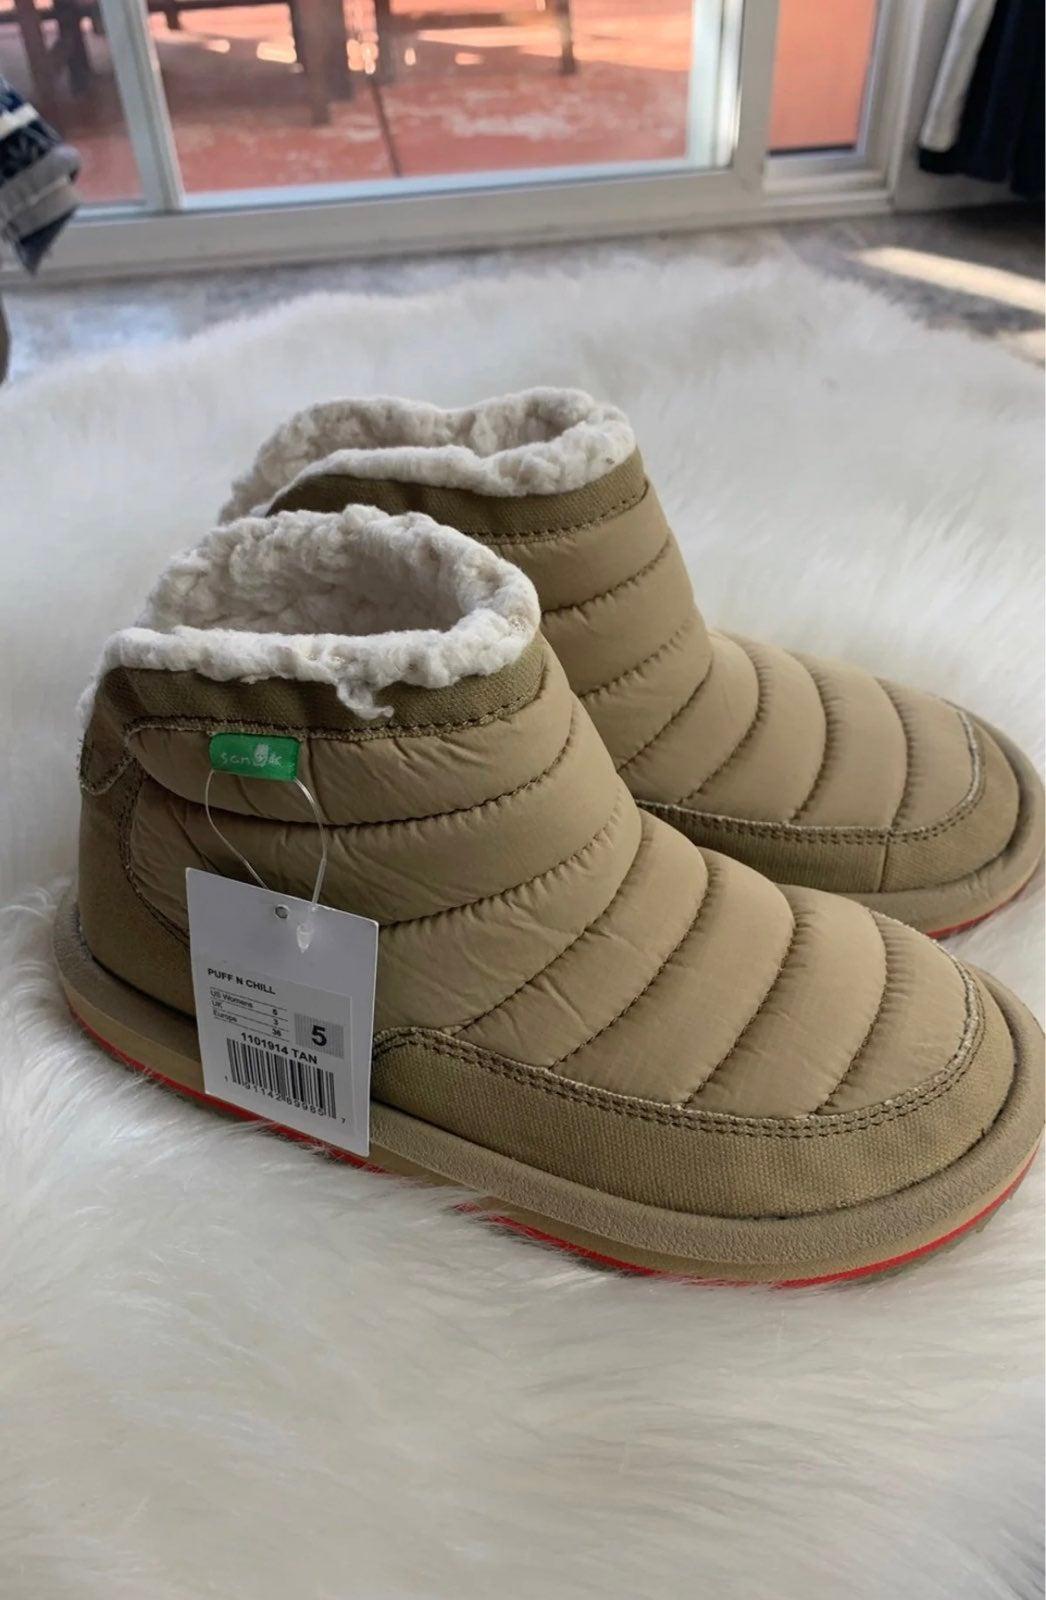 New Sanuk Women's Ankle Boot Size 5